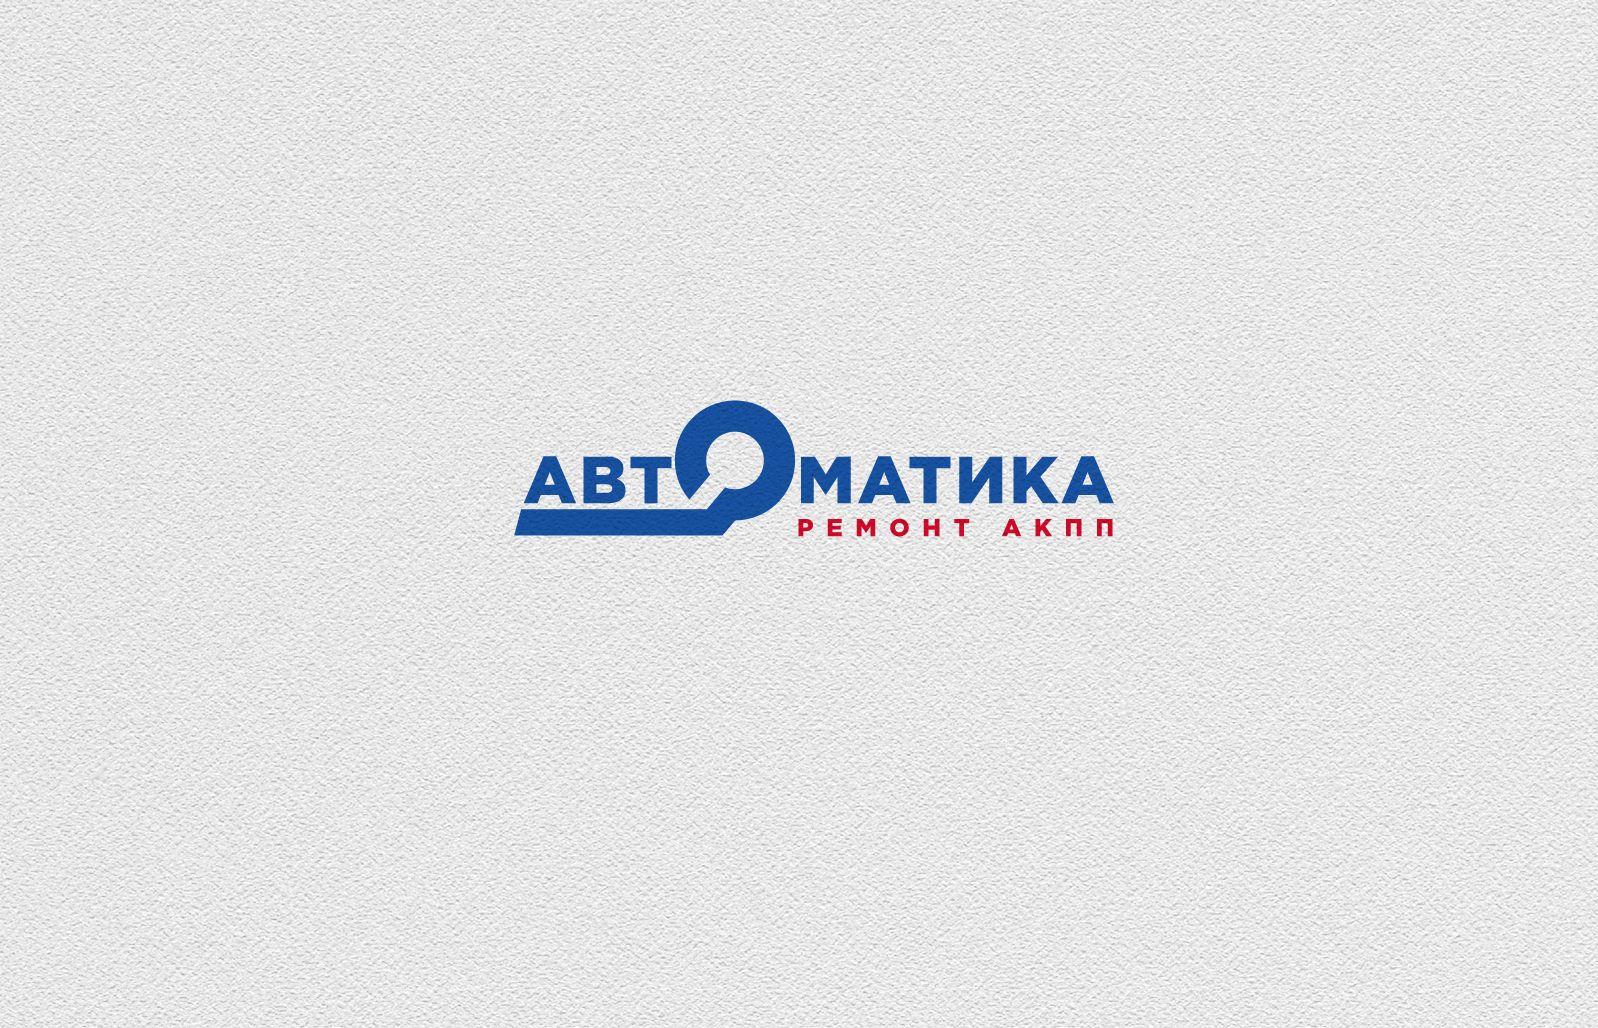 Логотип для АВТОМАТИКА - дизайнер andblin61